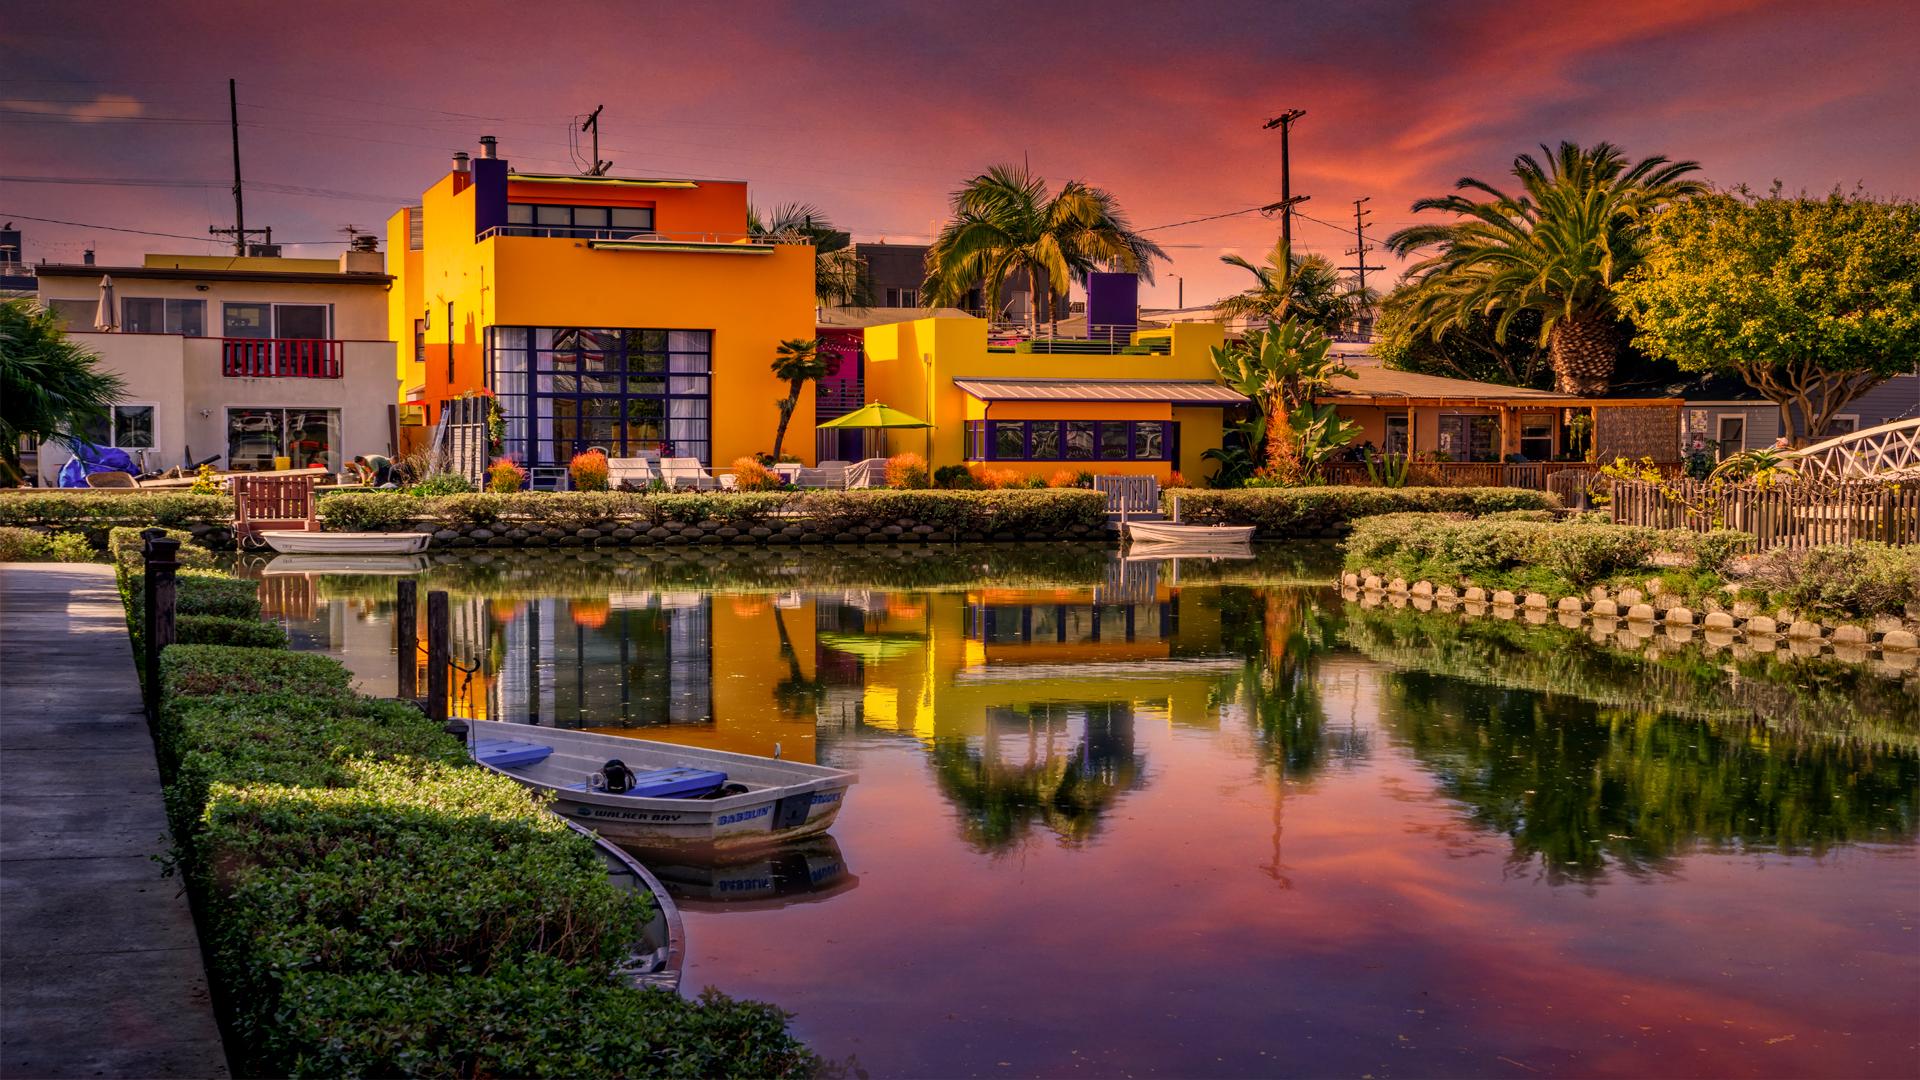 Venice Beach CanalsSunset4 2-14-18